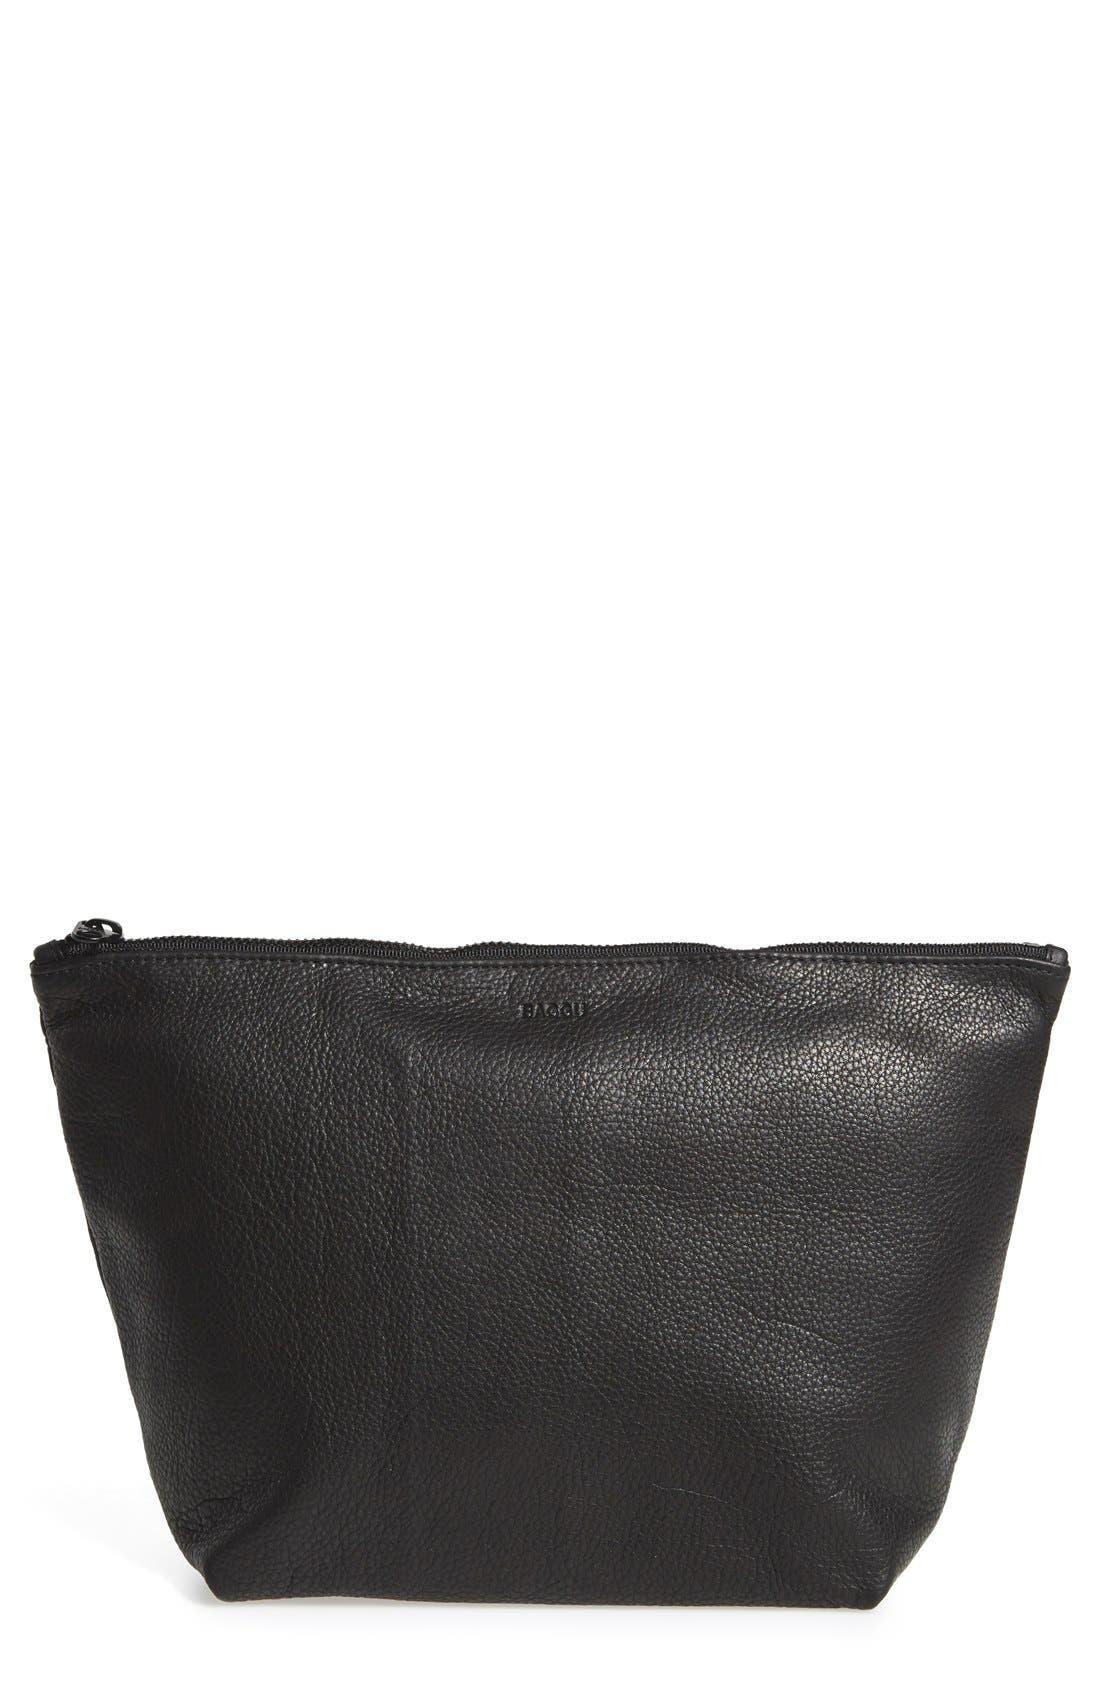 Large Leather Zip Pouch,                             Main thumbnail 1, color,                             001